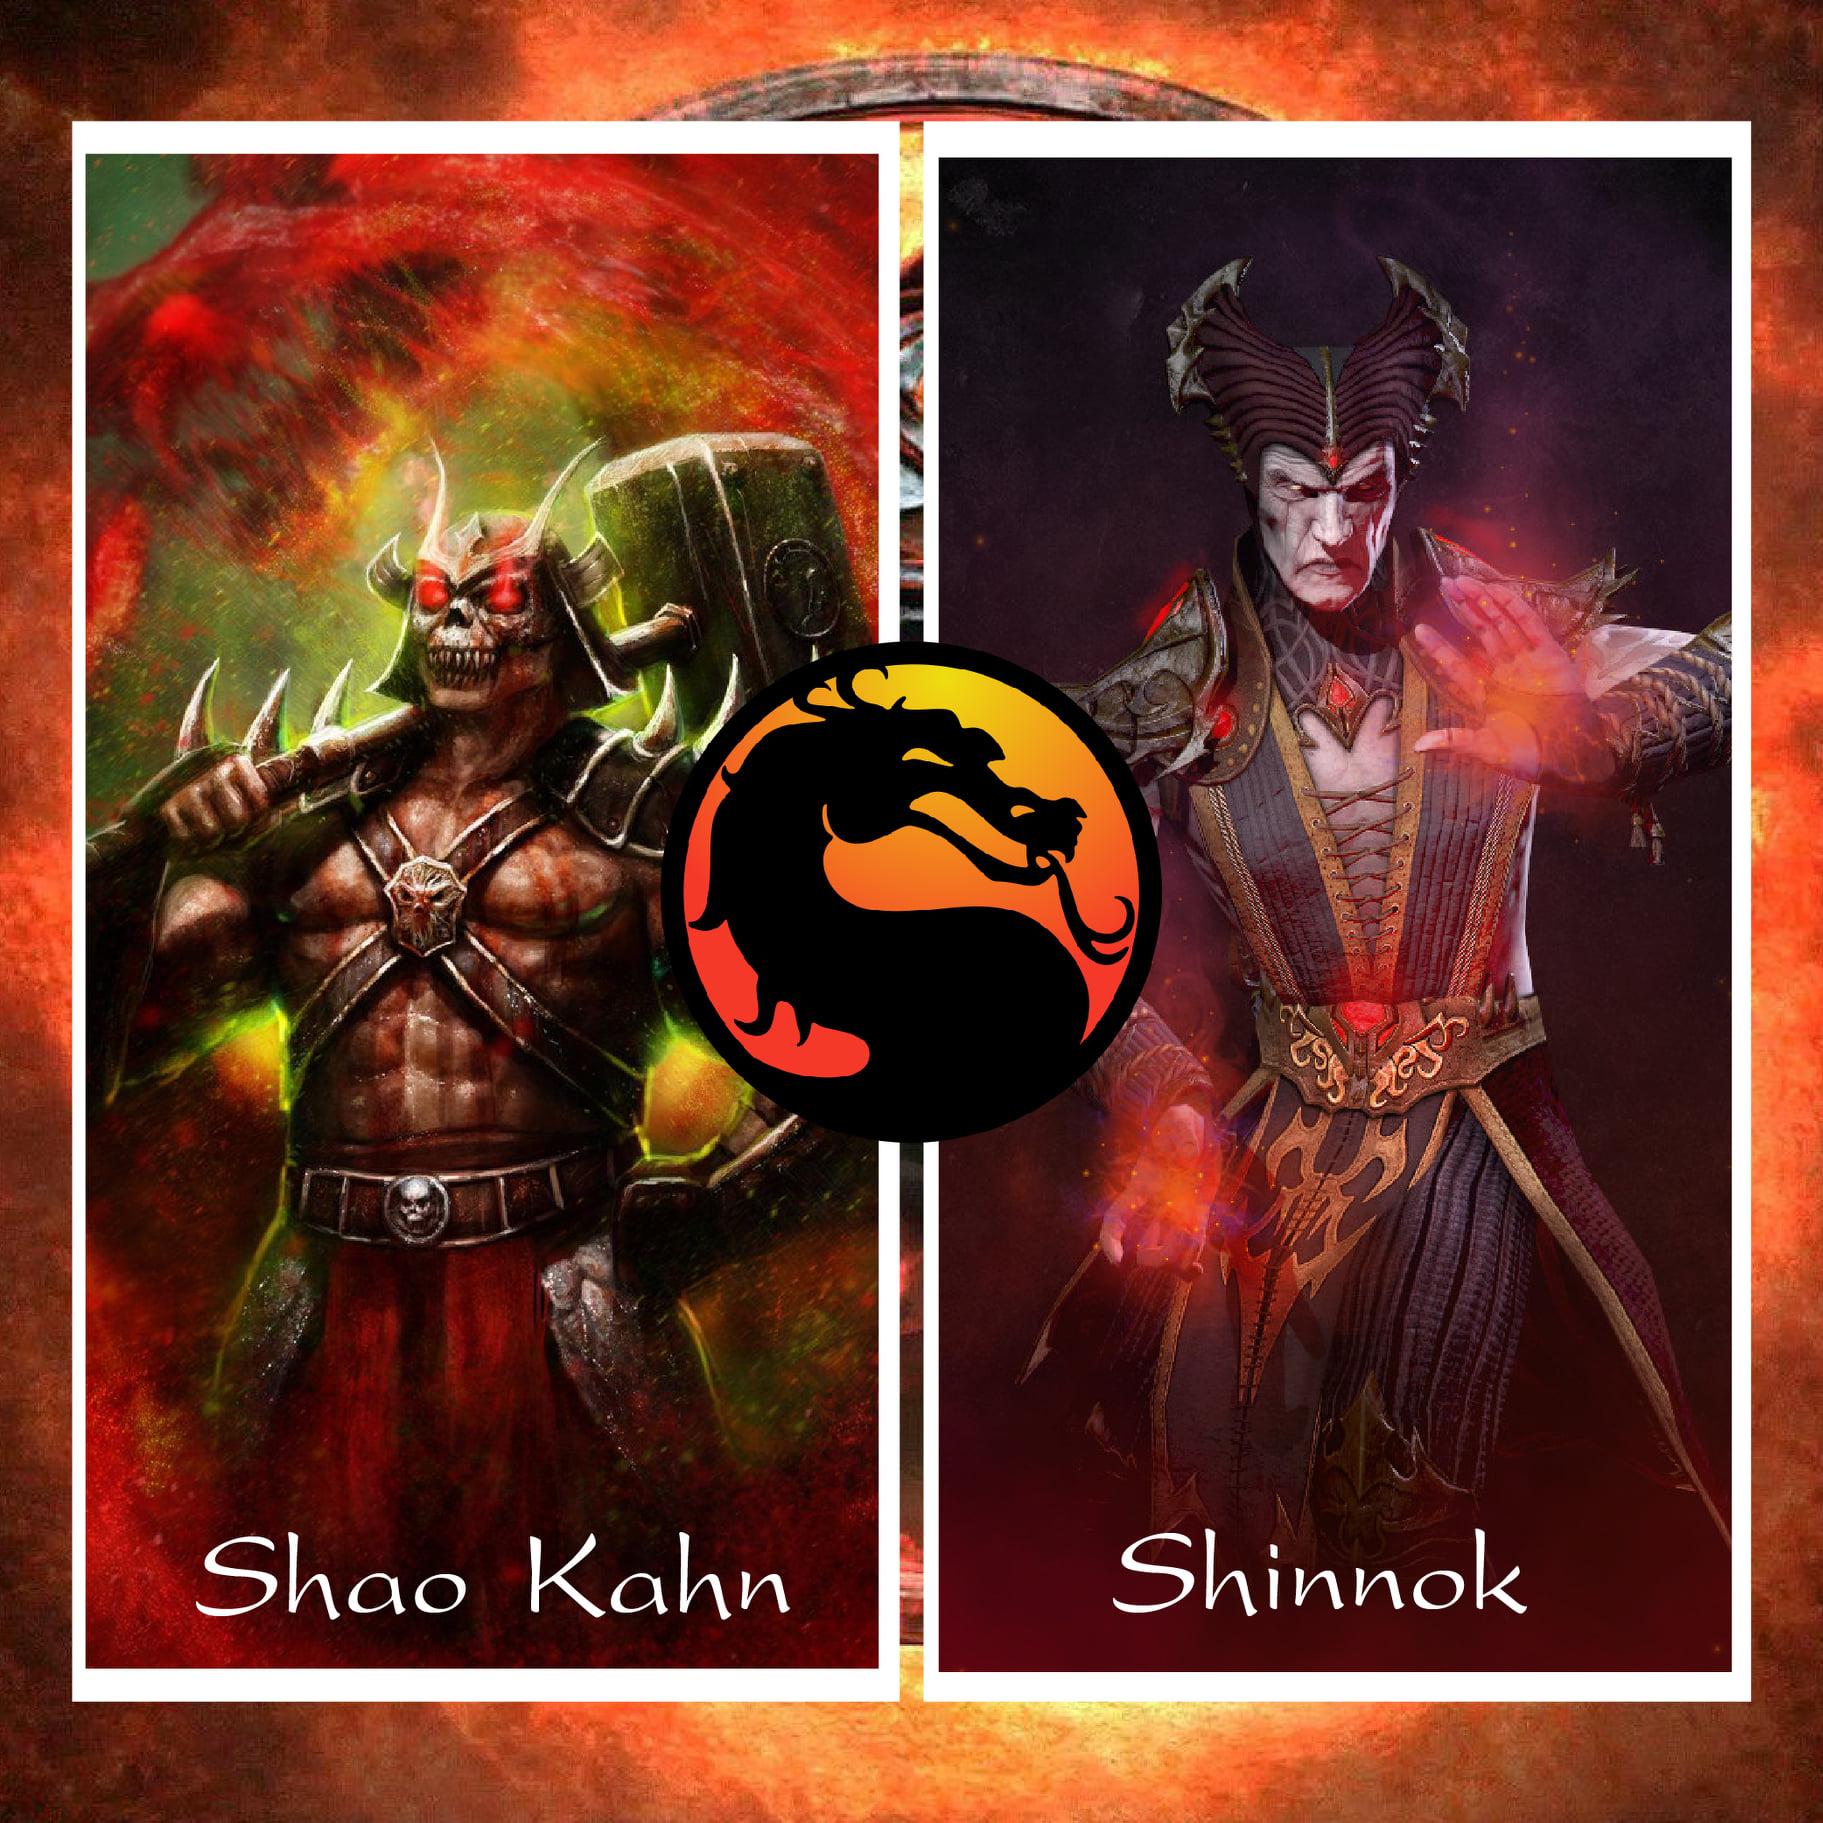 Shao Kahn vs Shinnok